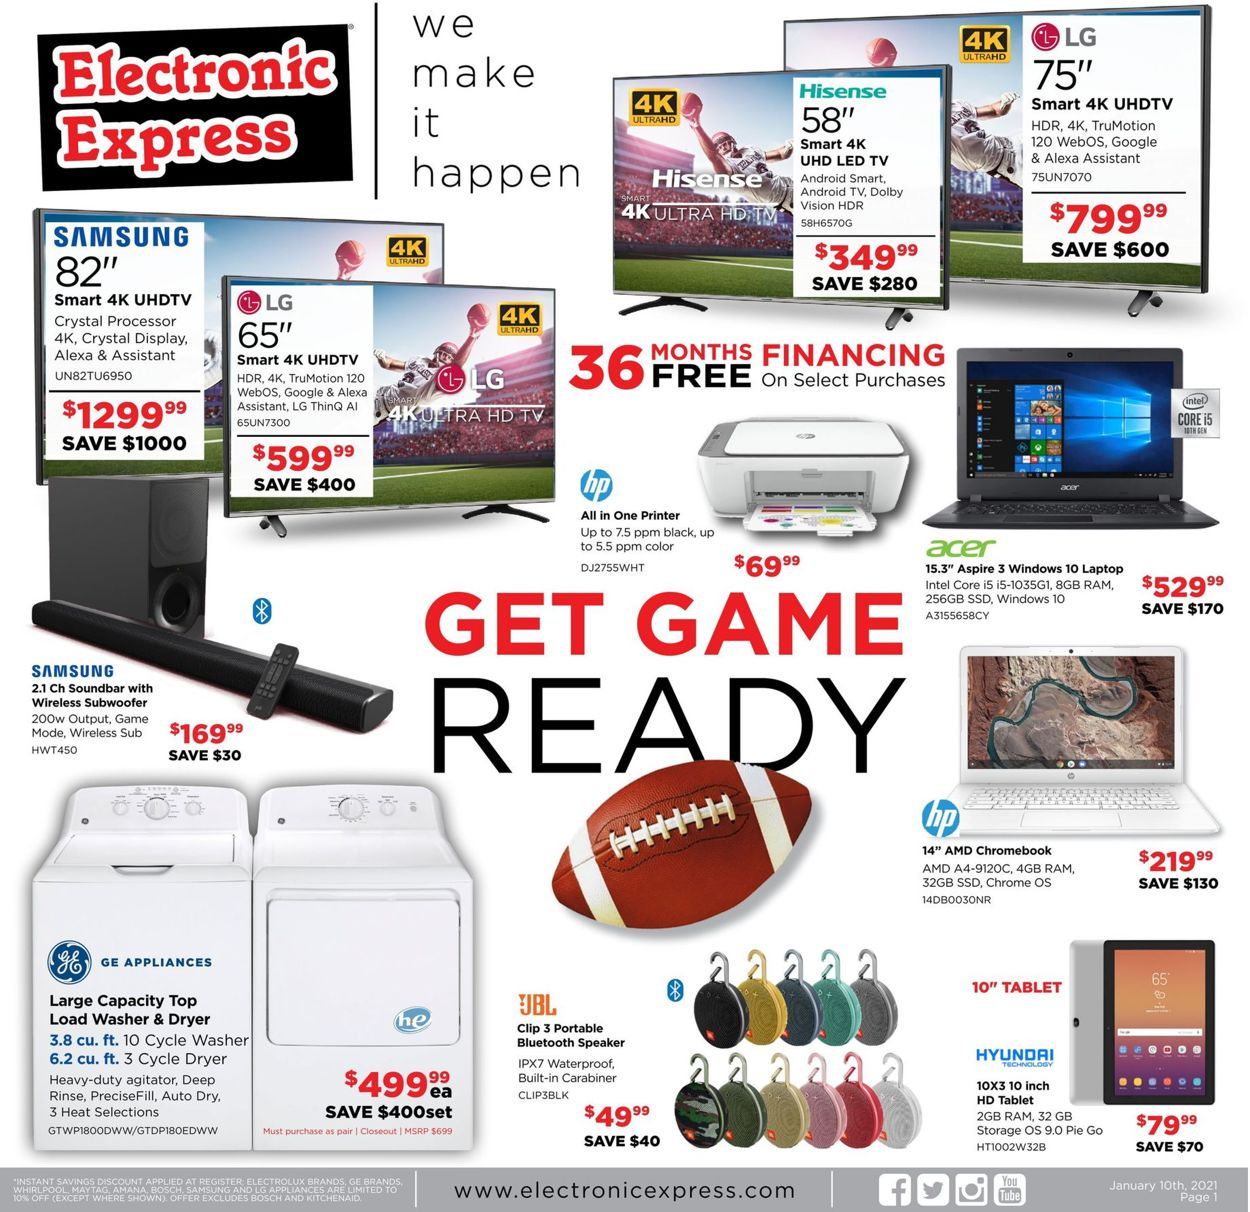 Electronic Express Weekly Ad Circular - valid 01/10-01/16/2021